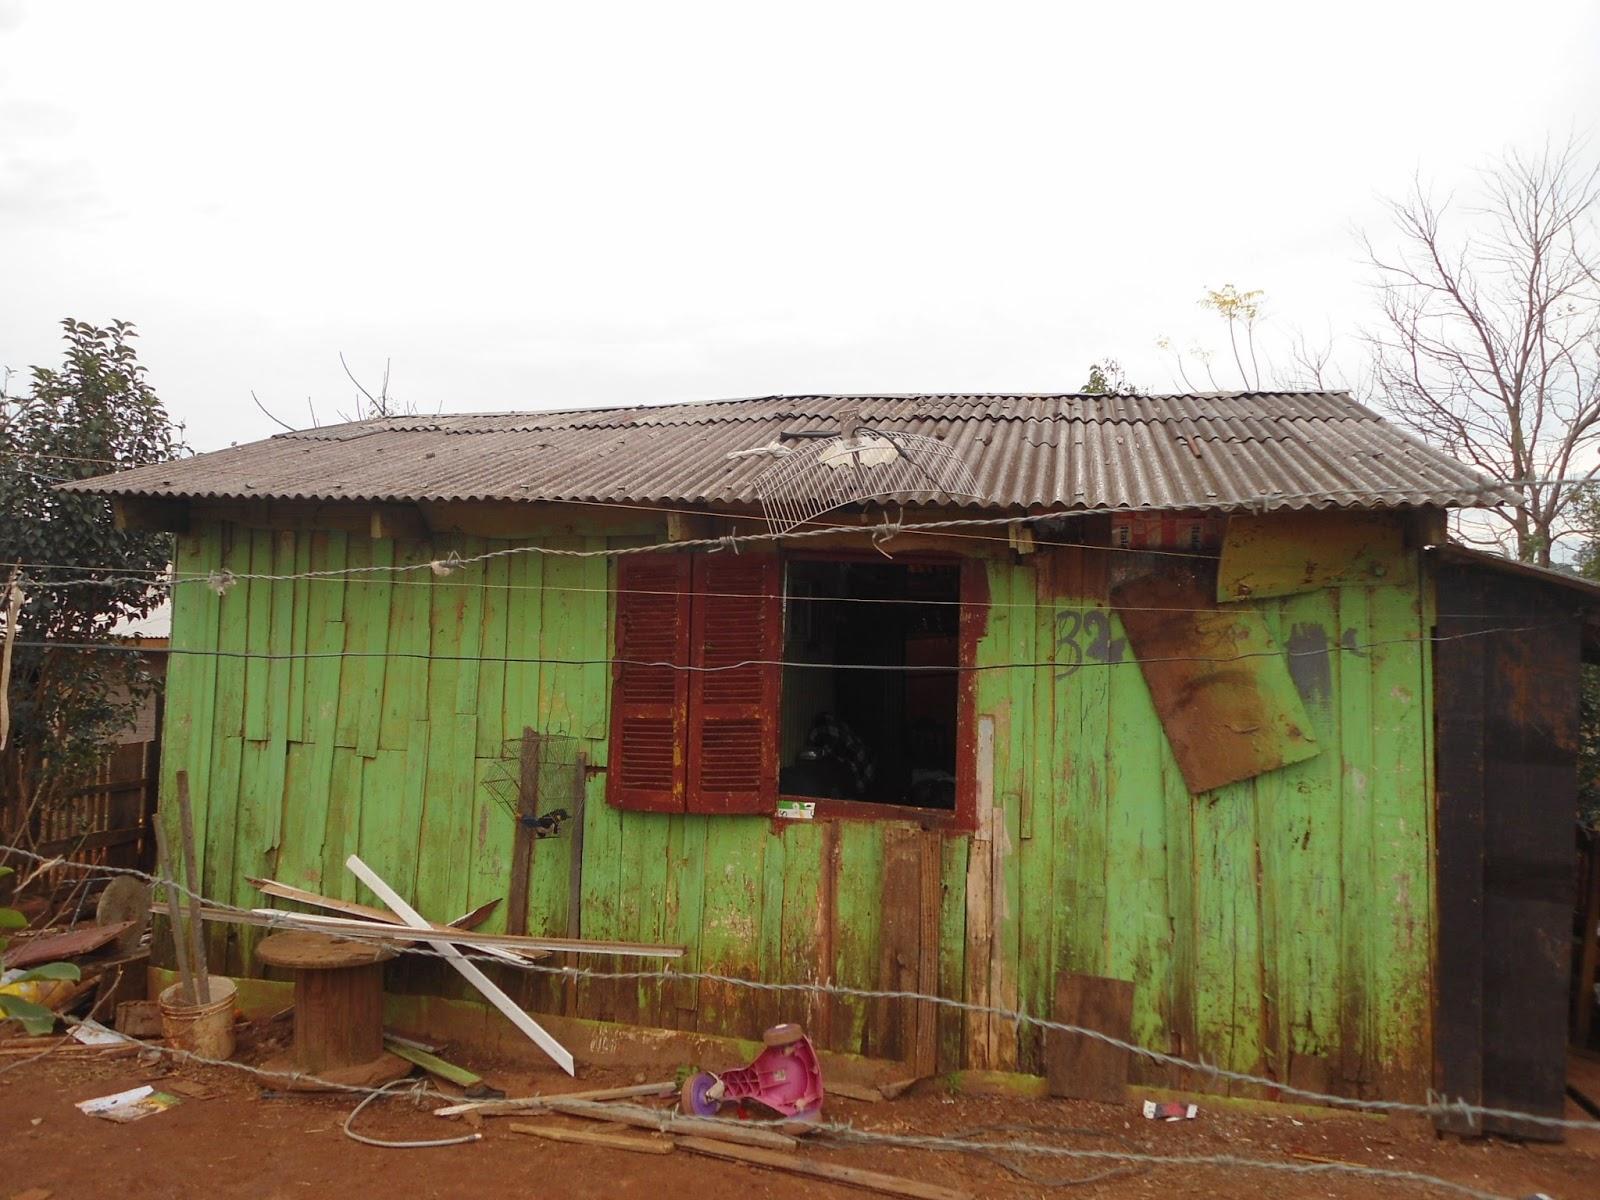 #6E4328 Brasil sem Frestas: Setembro 2014 470 Janelas Duplas Isolamento